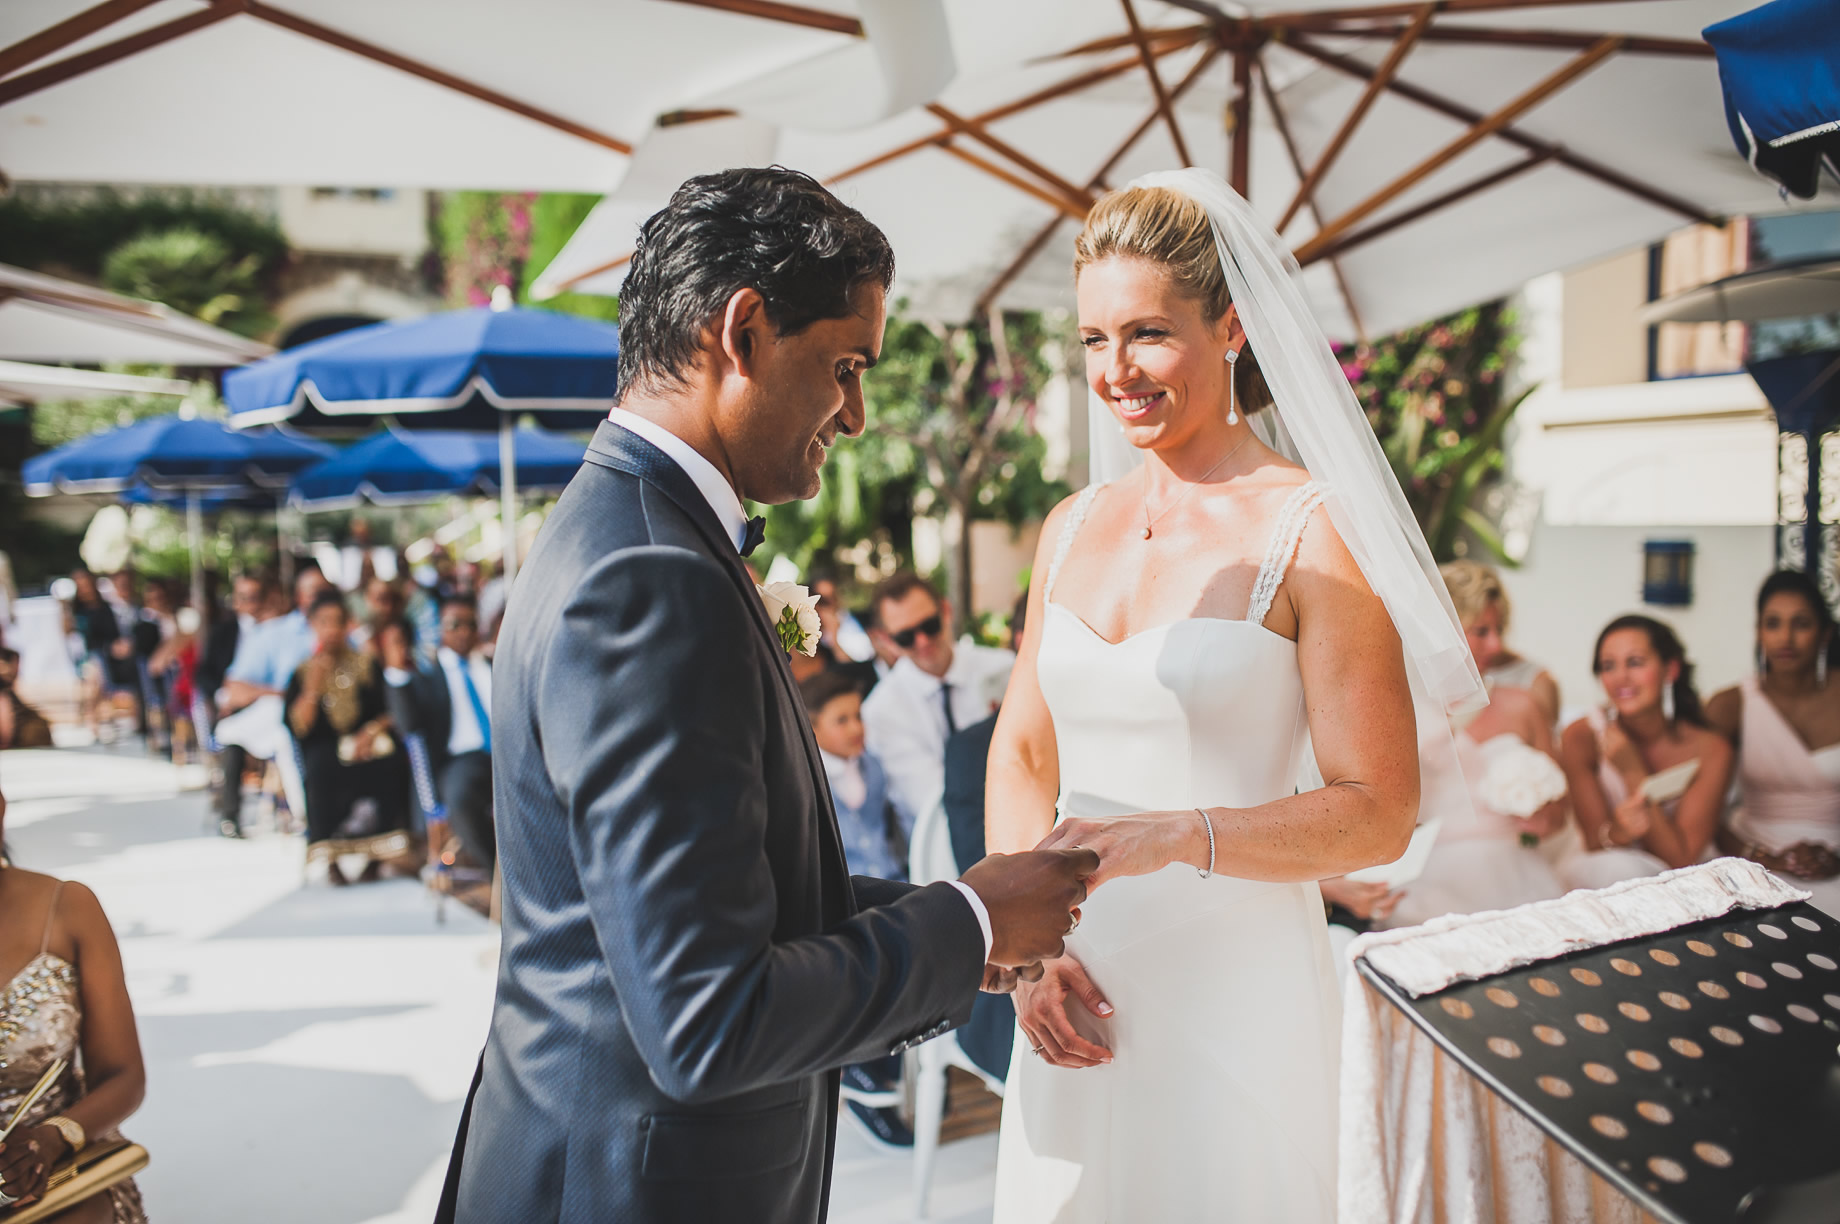 Jen and Priyan's Wedding - A Preview 006